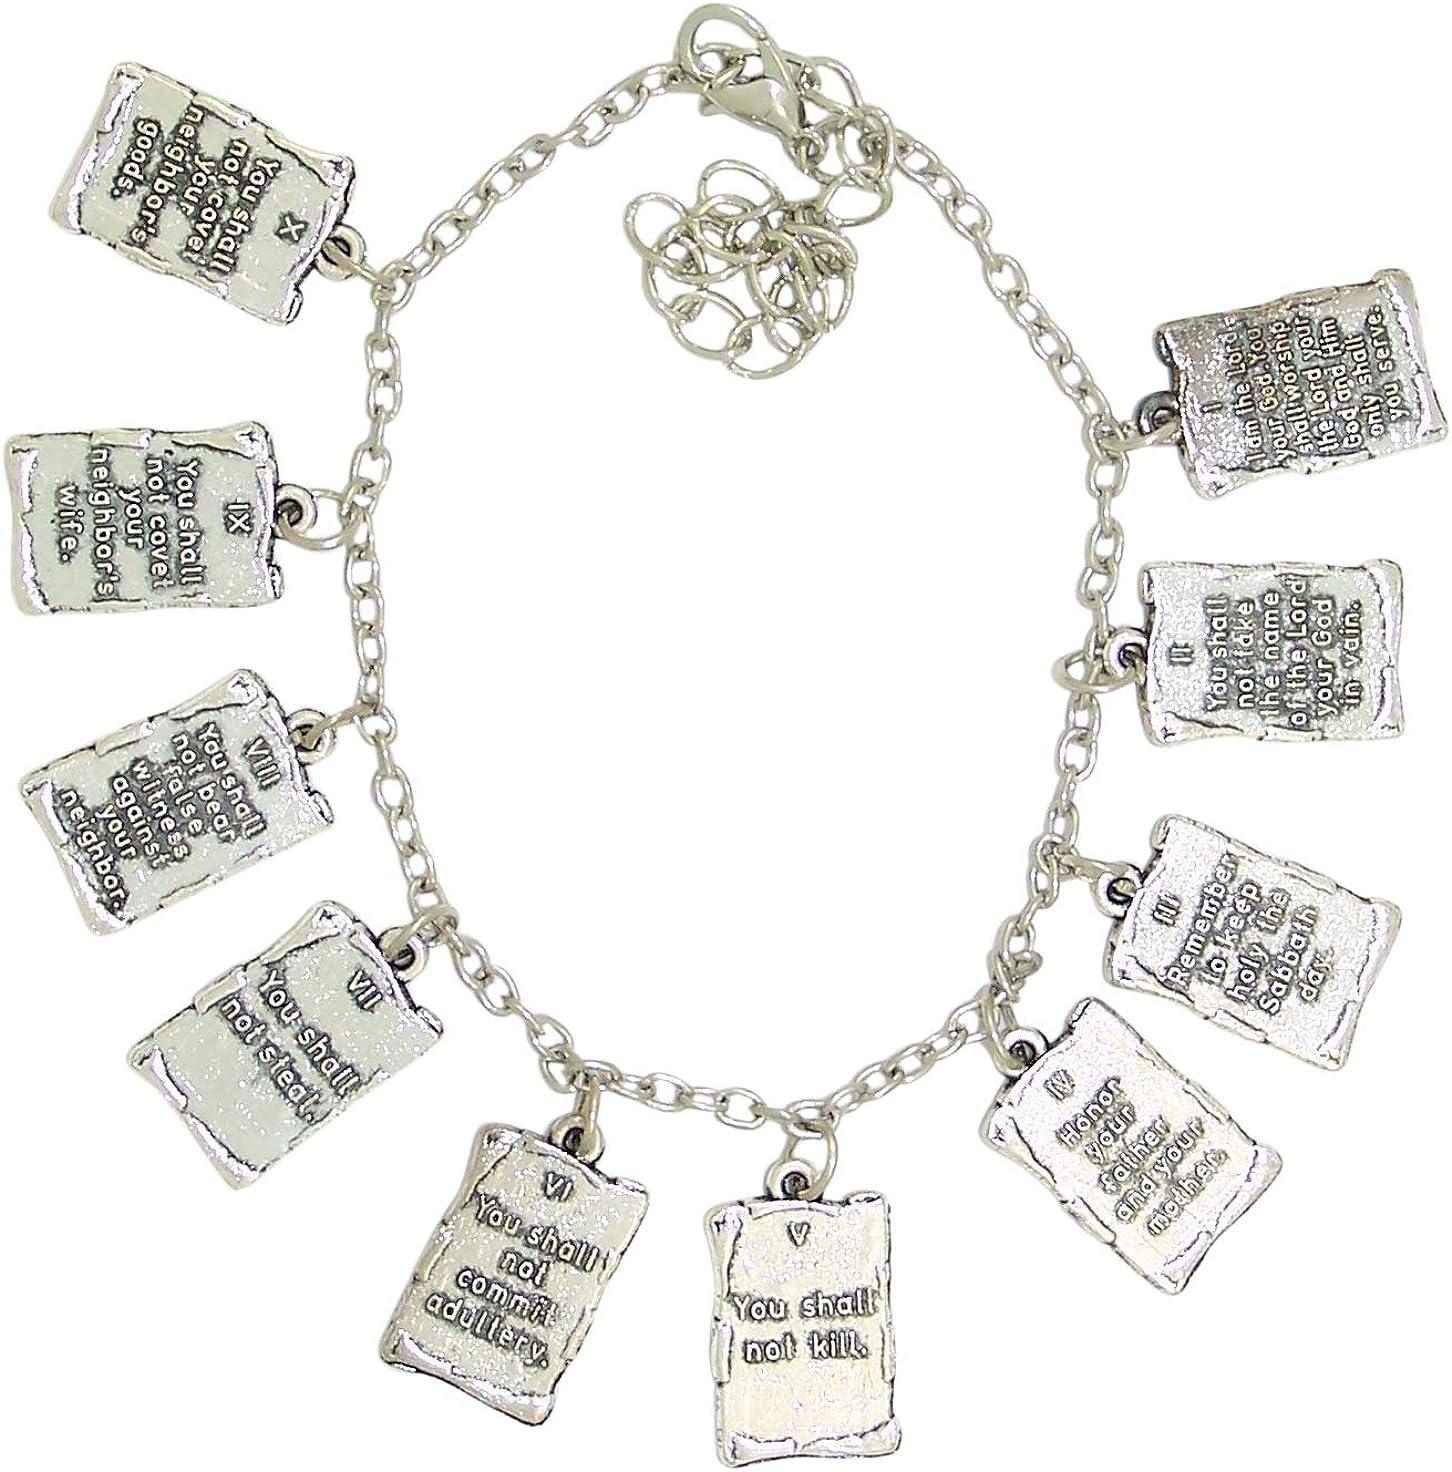 Silver Tone Ten Commandments Charm Quality inspection Bracelet Inch 2 7 1 Colorado Springs Mall